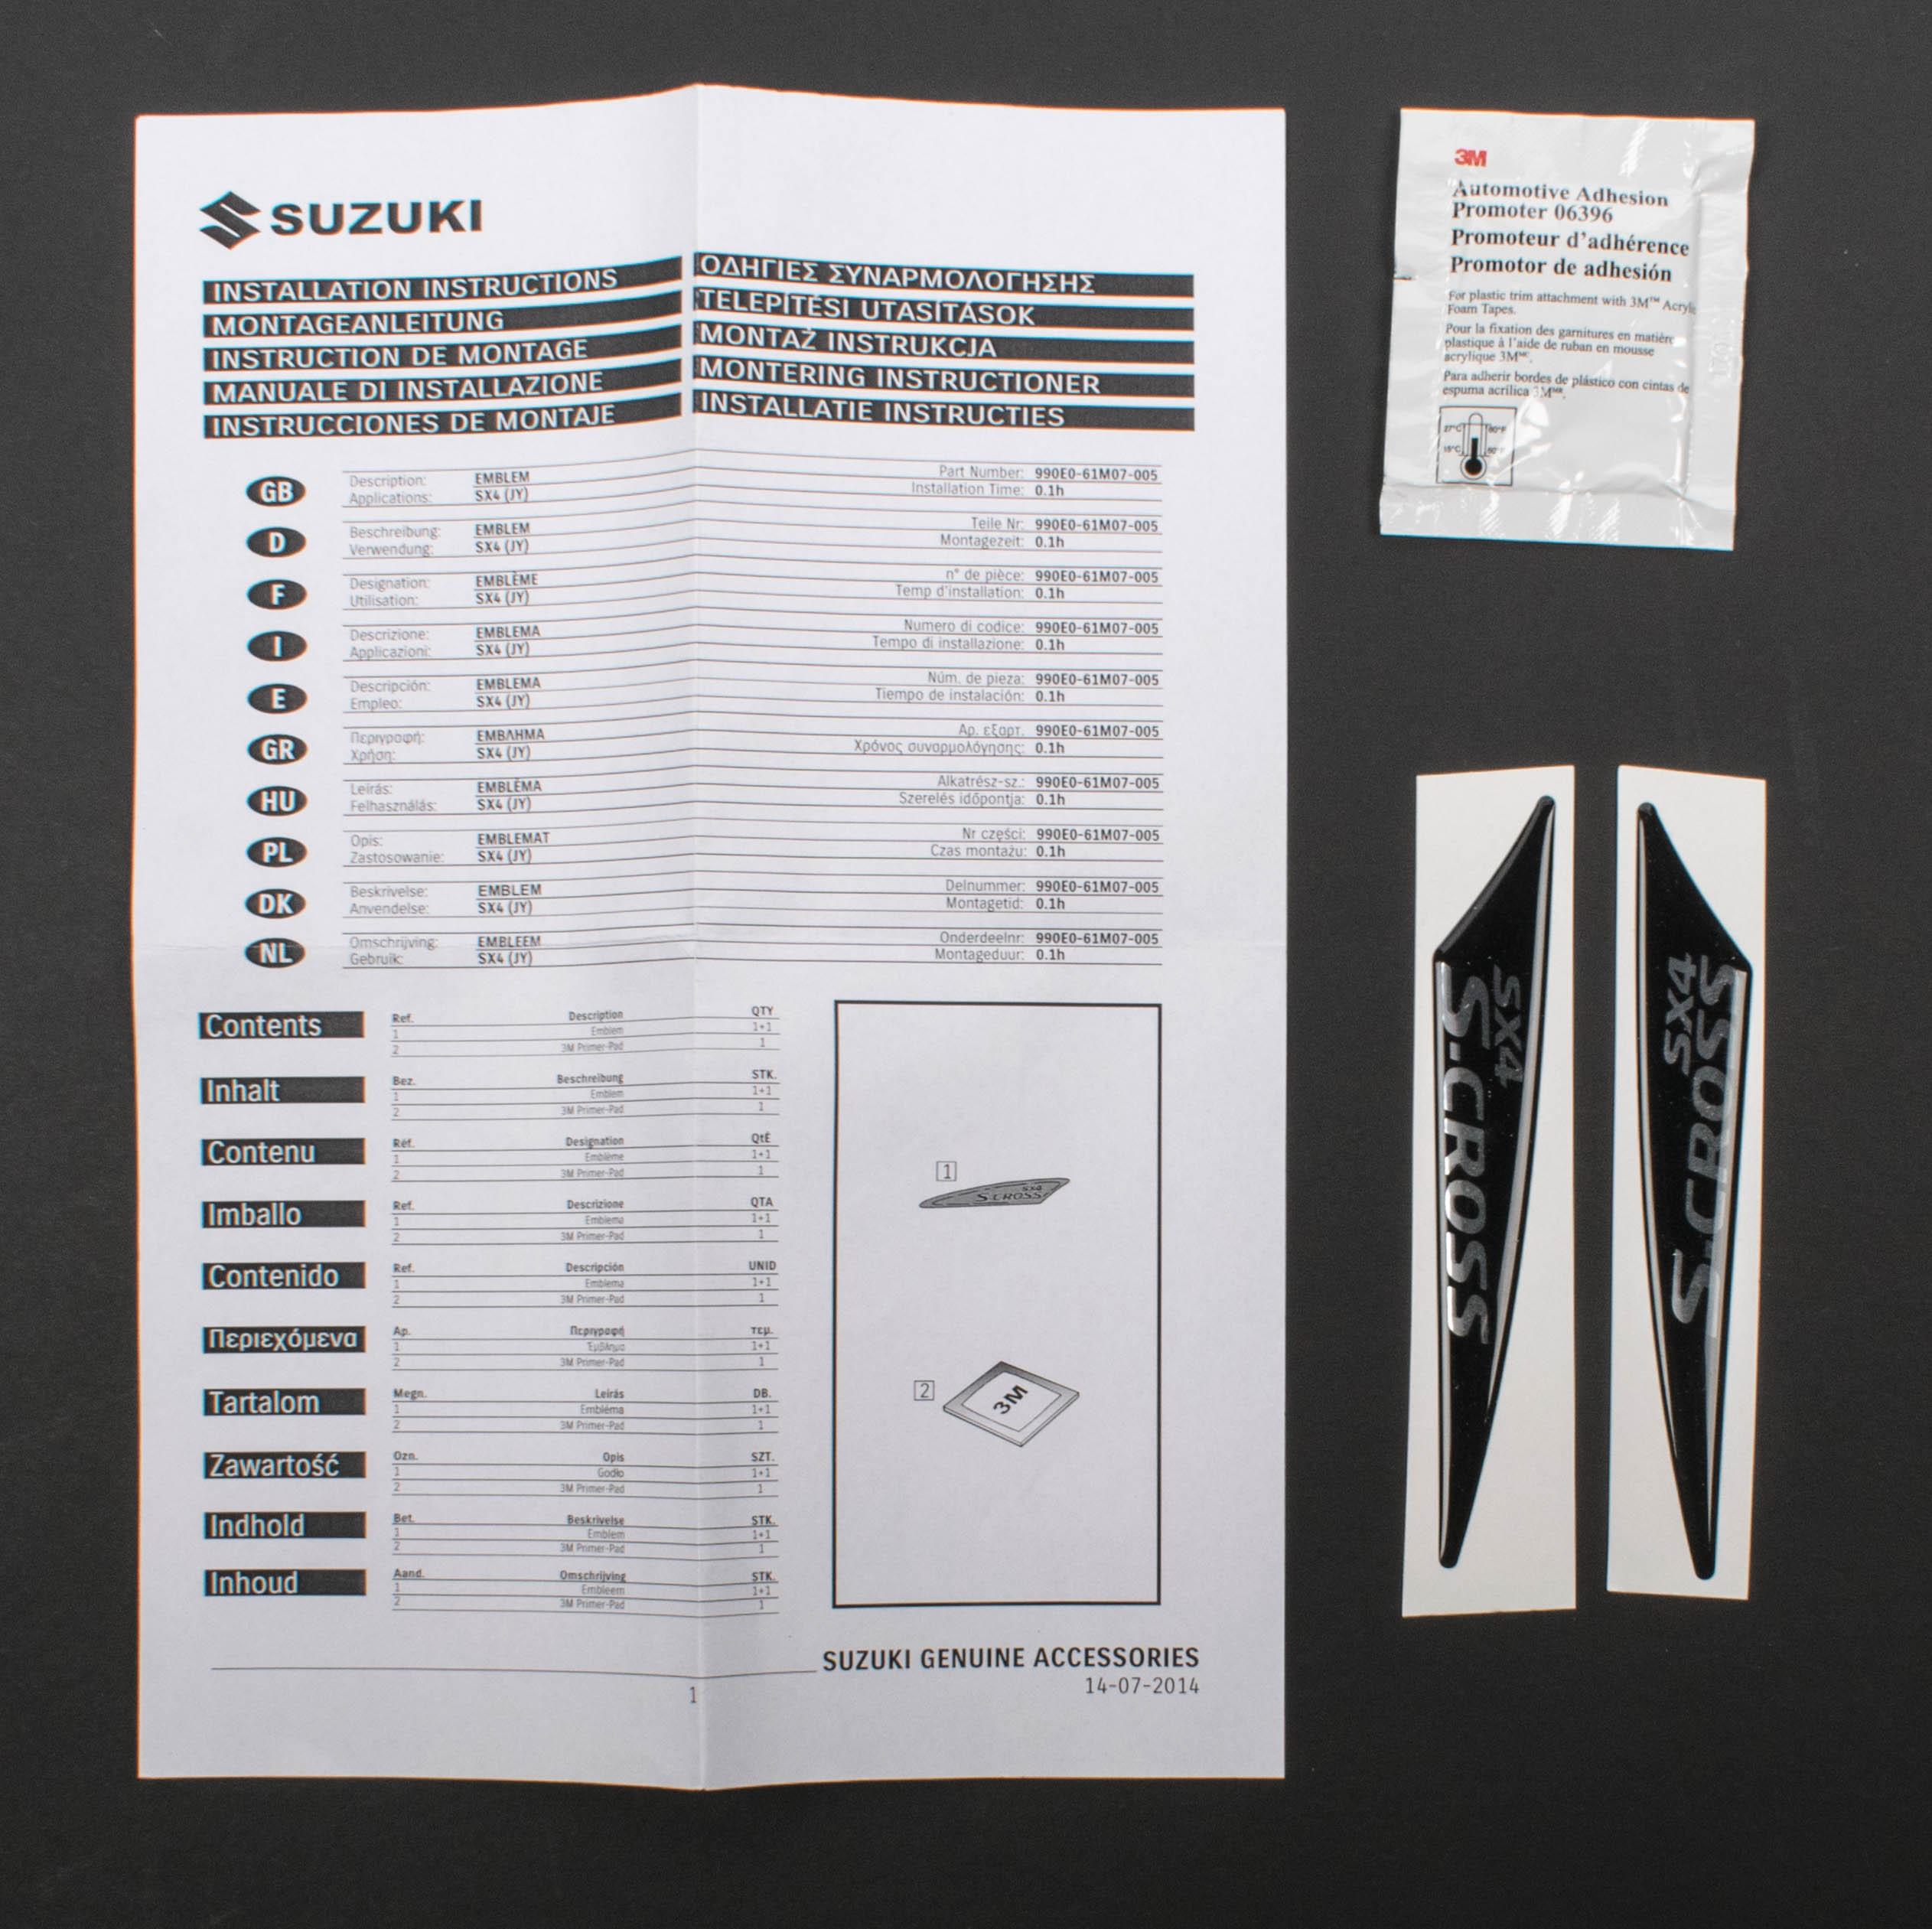 Suzuki Genuine SX4 S-Cross Facelift Side Body Moulding Badge Set 990E0-61M07-005